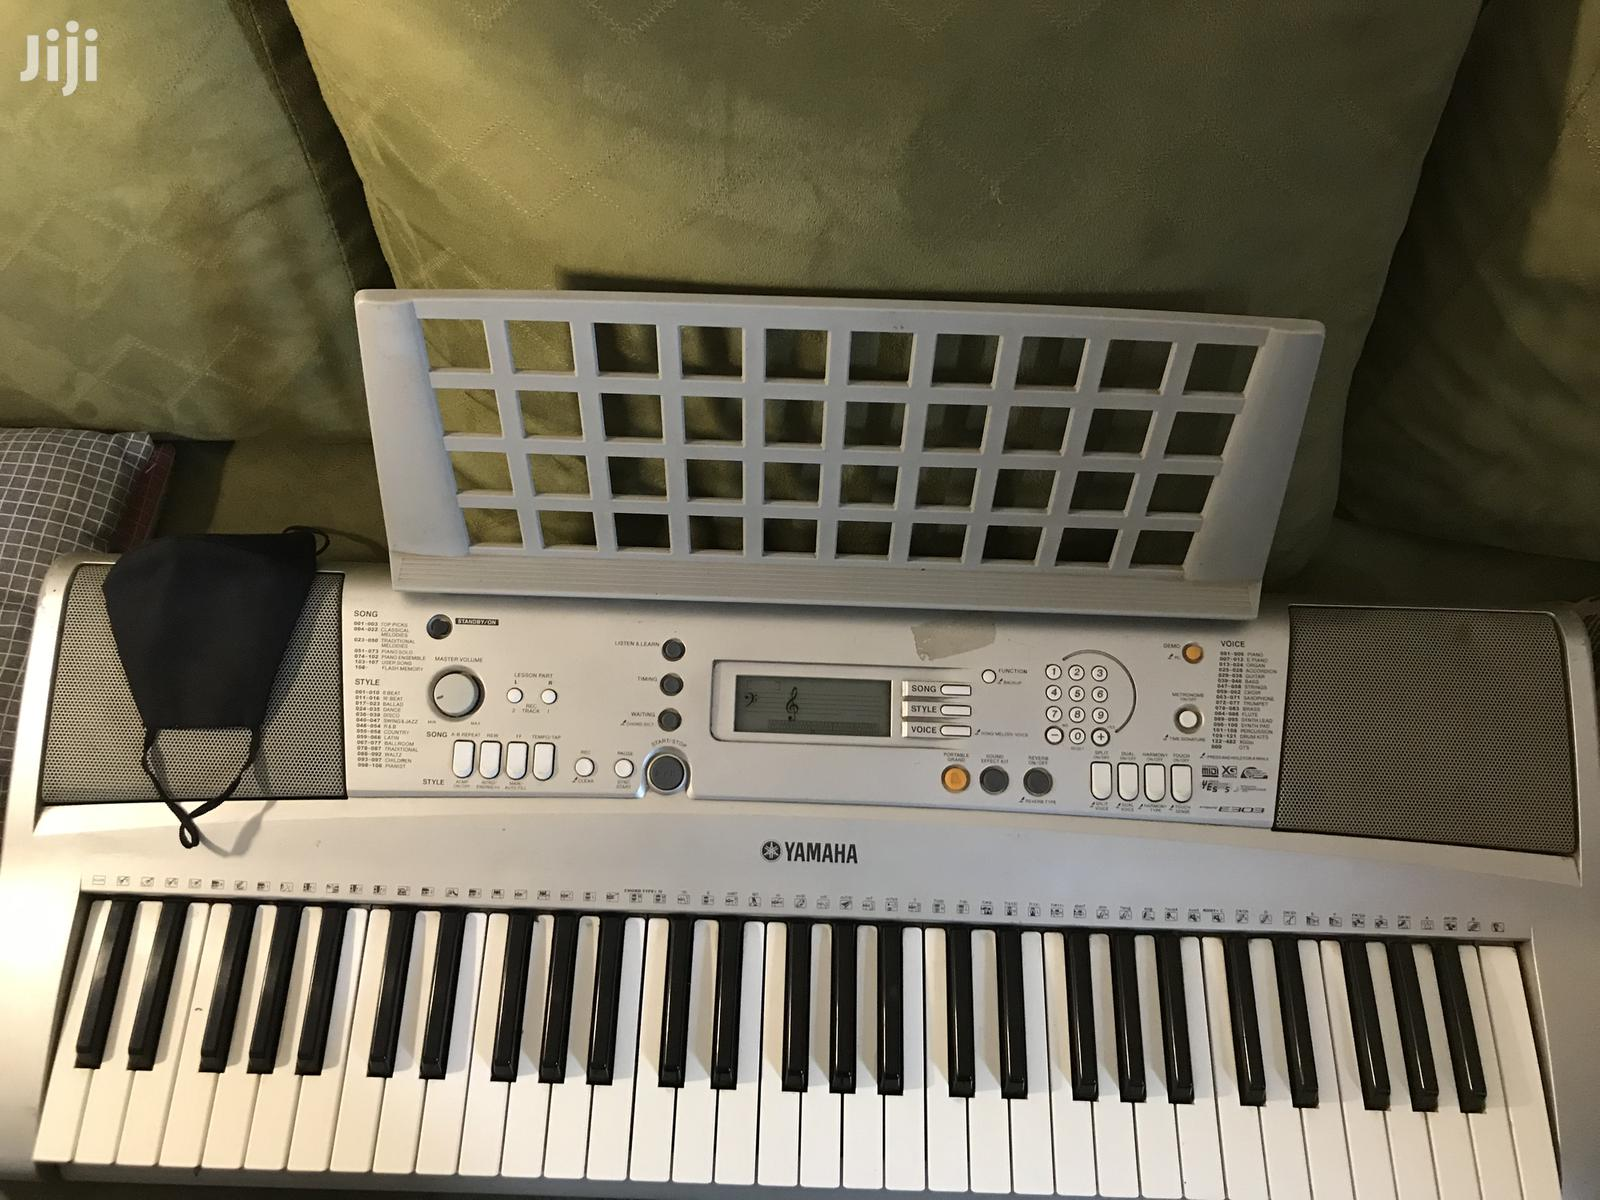 Yamaha Music Keyboard Piano   Musical Instruments & Gear for sale in Karen, Nairobi, Kenya